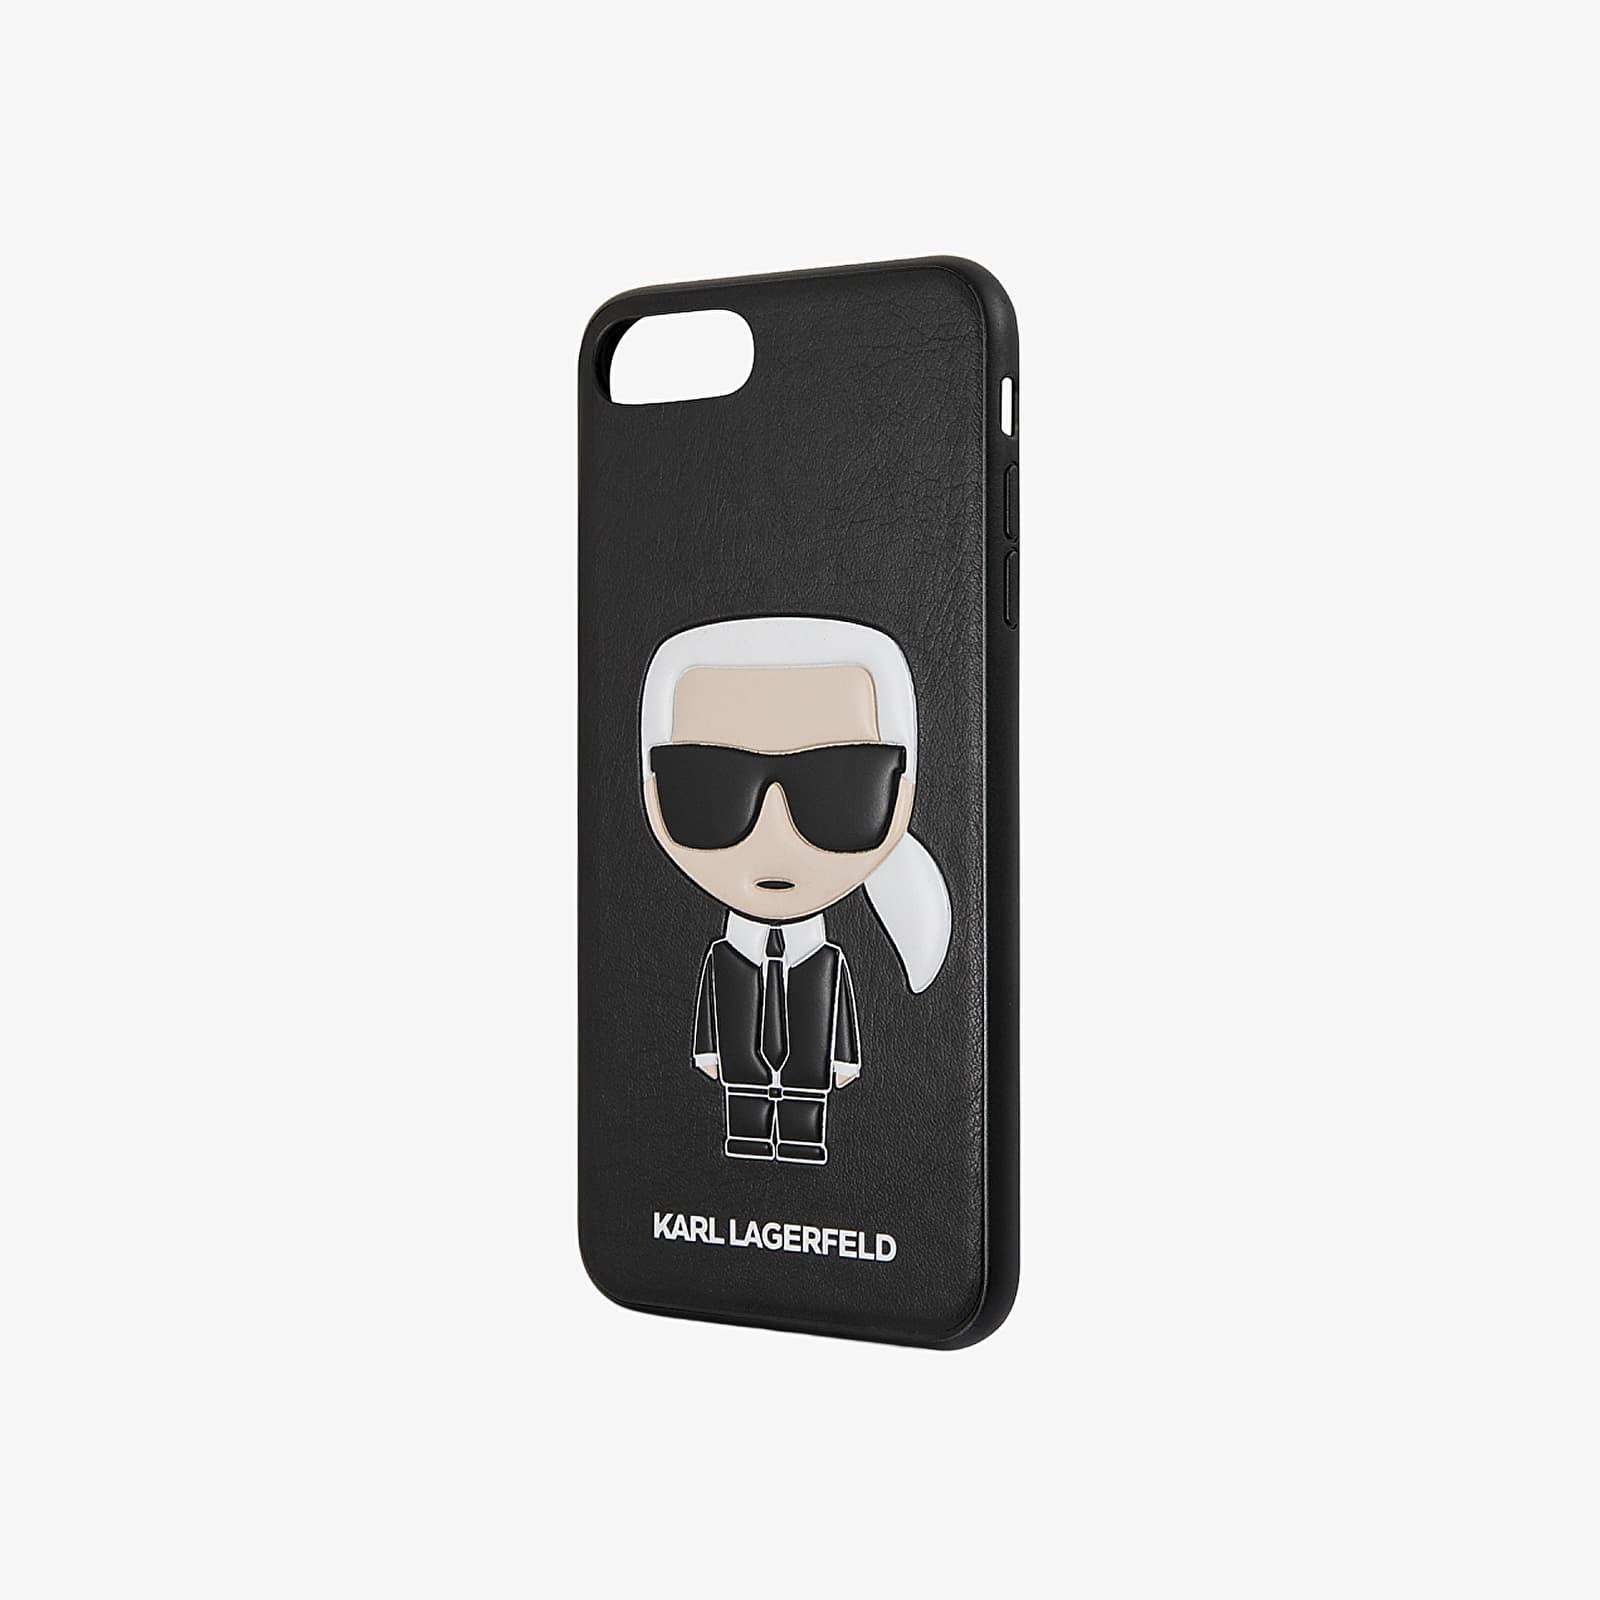 Karl Lagerfeld Cover Ikonik iPhone 7/8 Plus Black Universal